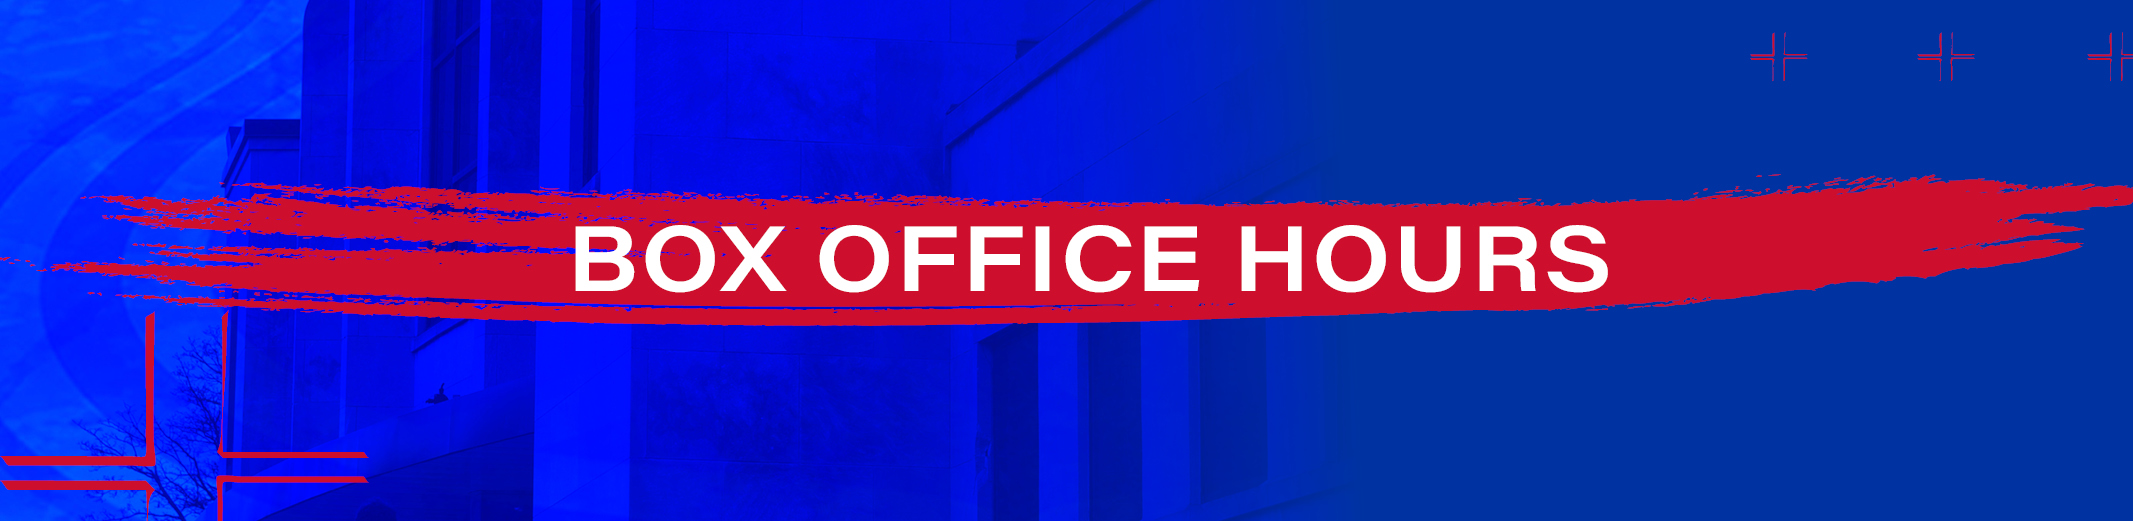 BoxOffice_Hours